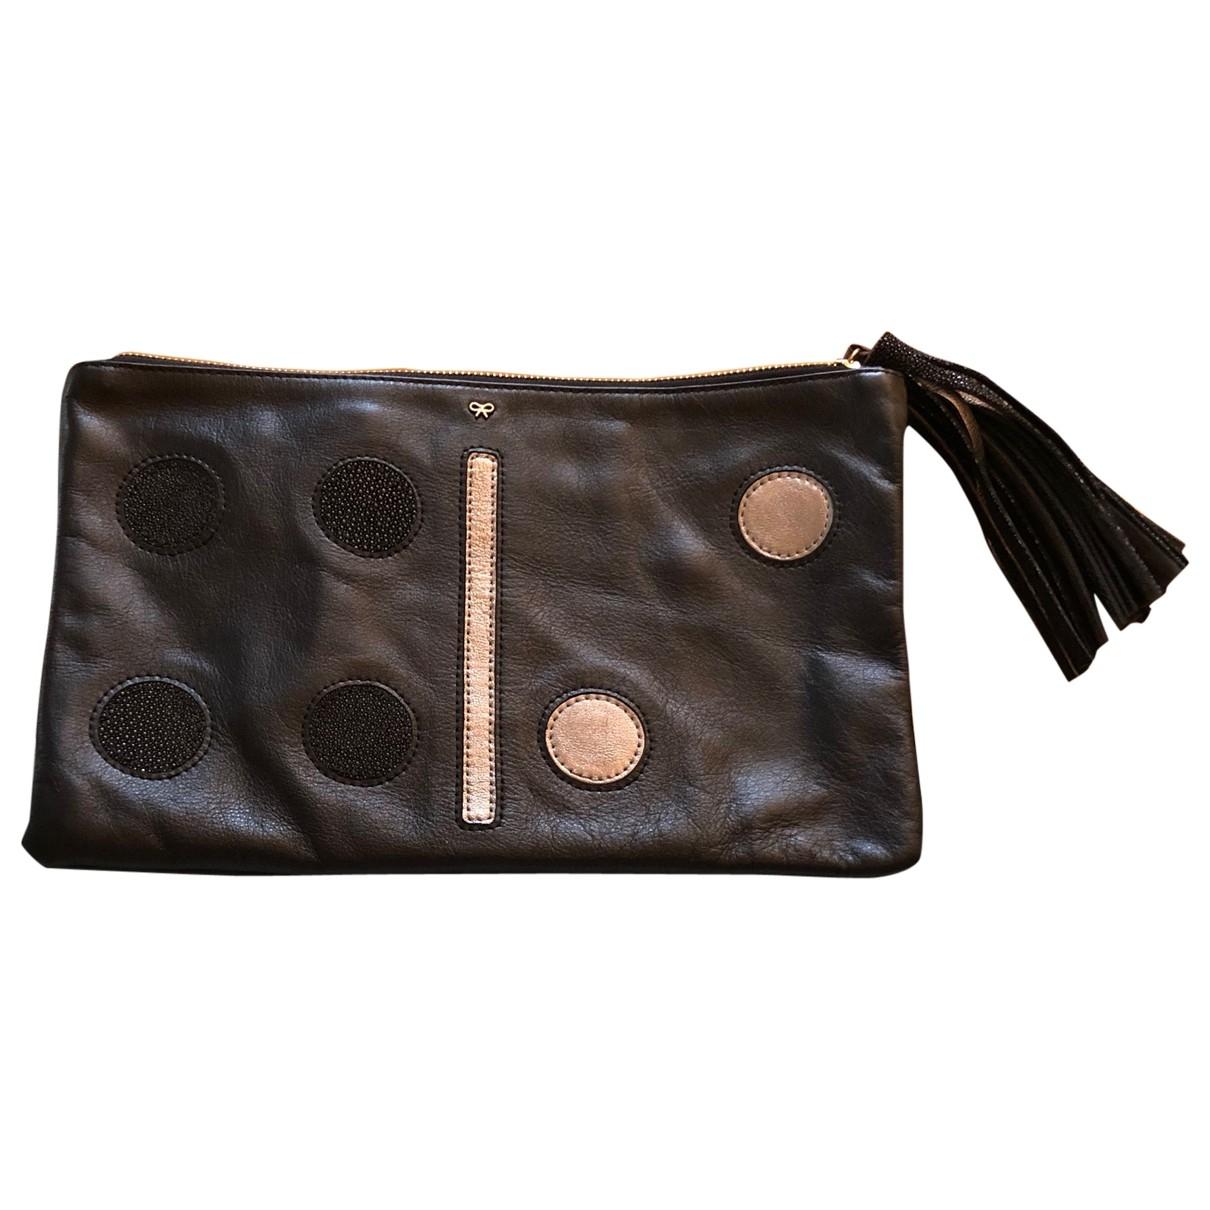 Anya Hindmarch - Pochette   pour femme en cuir - noir